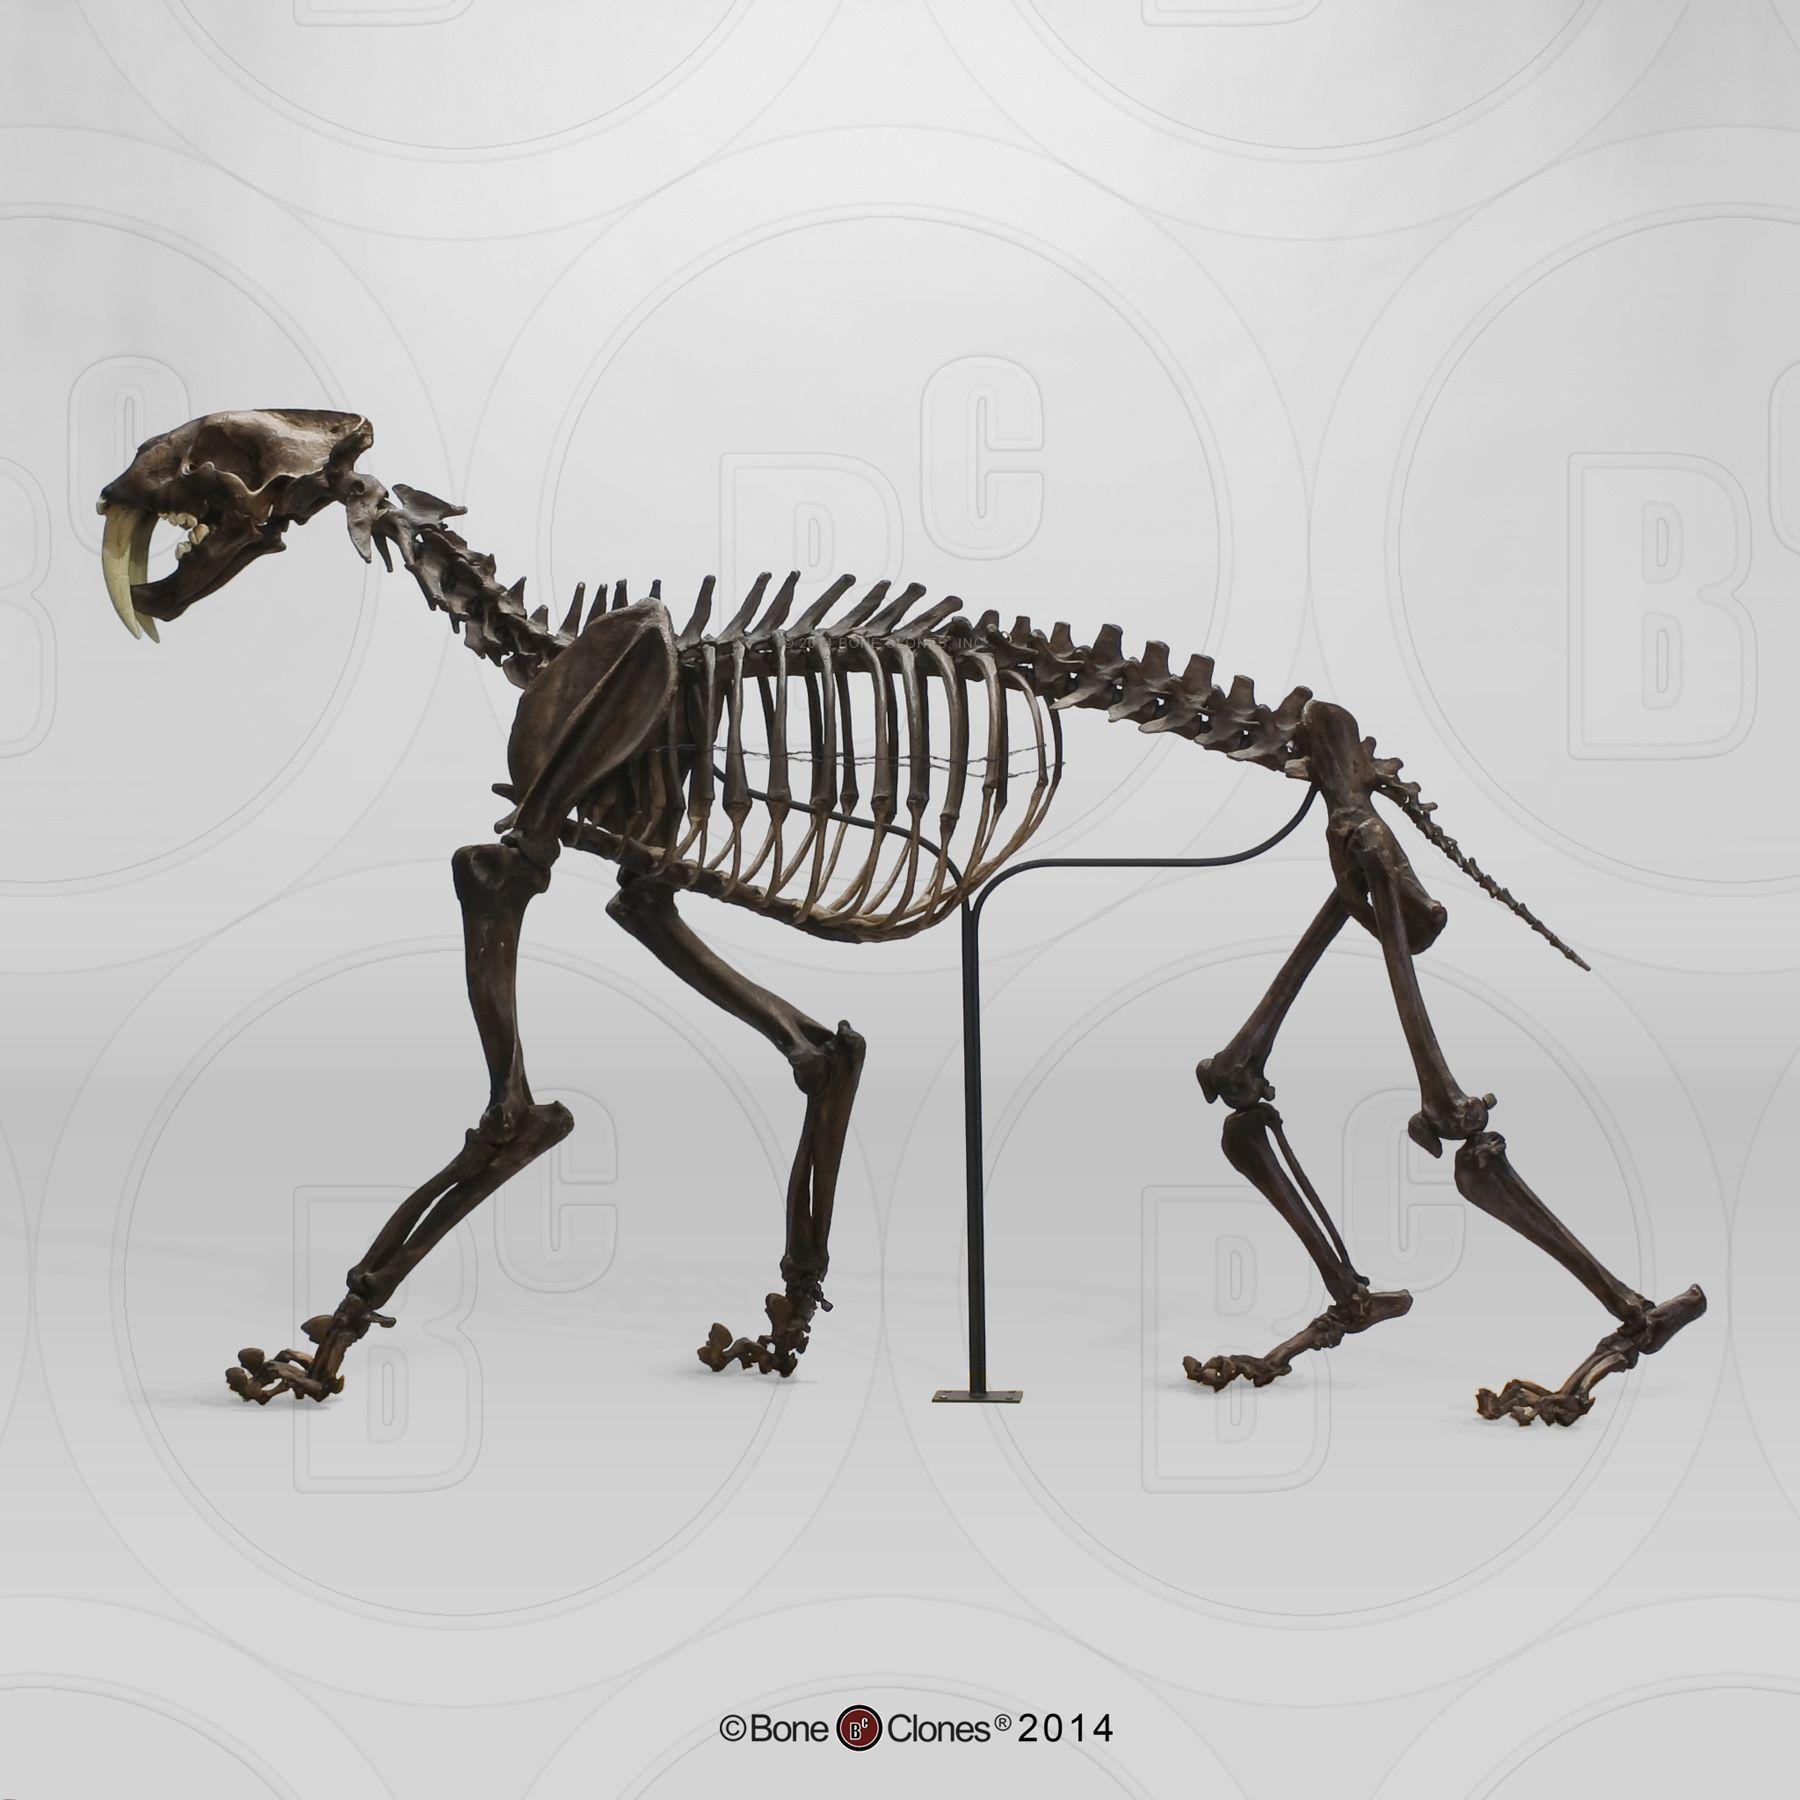 hight resolution of resultado de imagen de saber tooth tiger skull replica